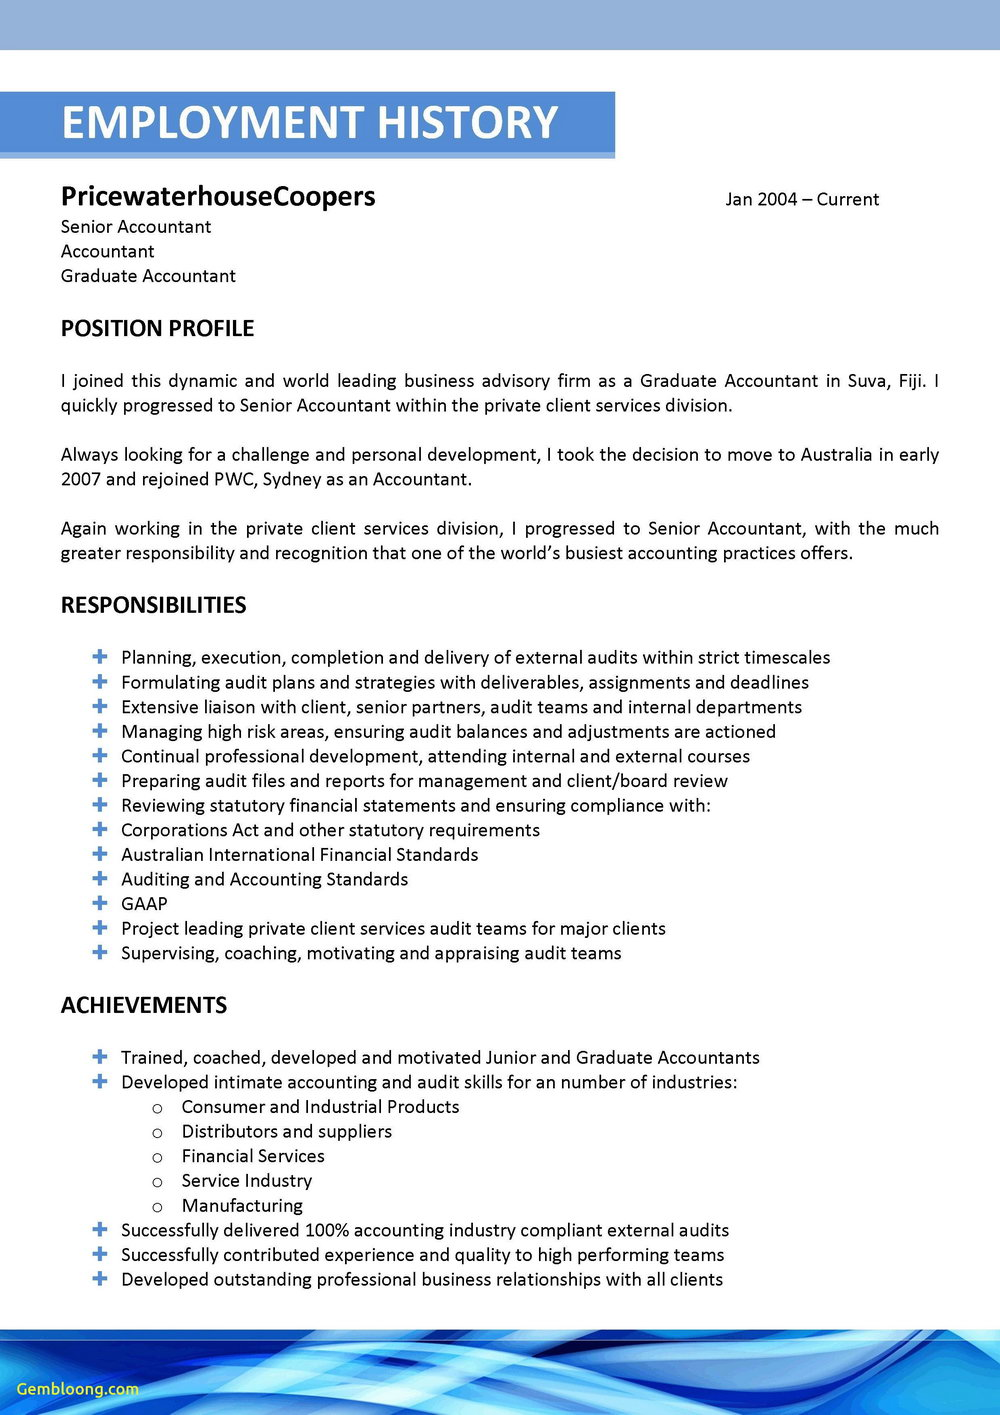 Free Online Resume Builder Quora